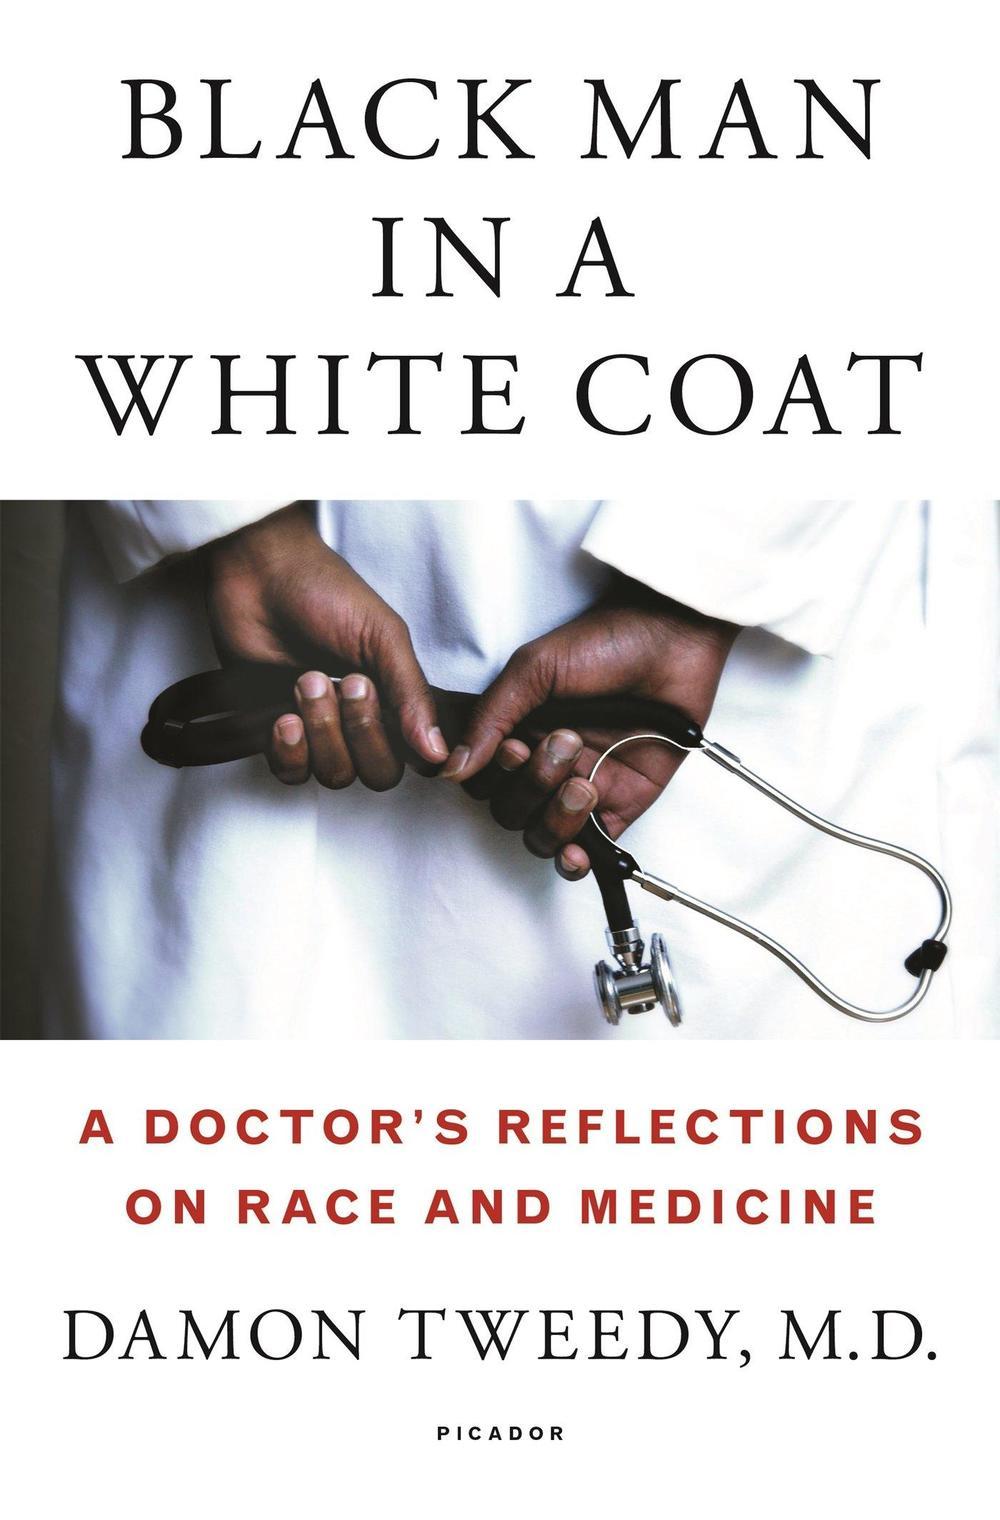 black man in a white coat.jpg